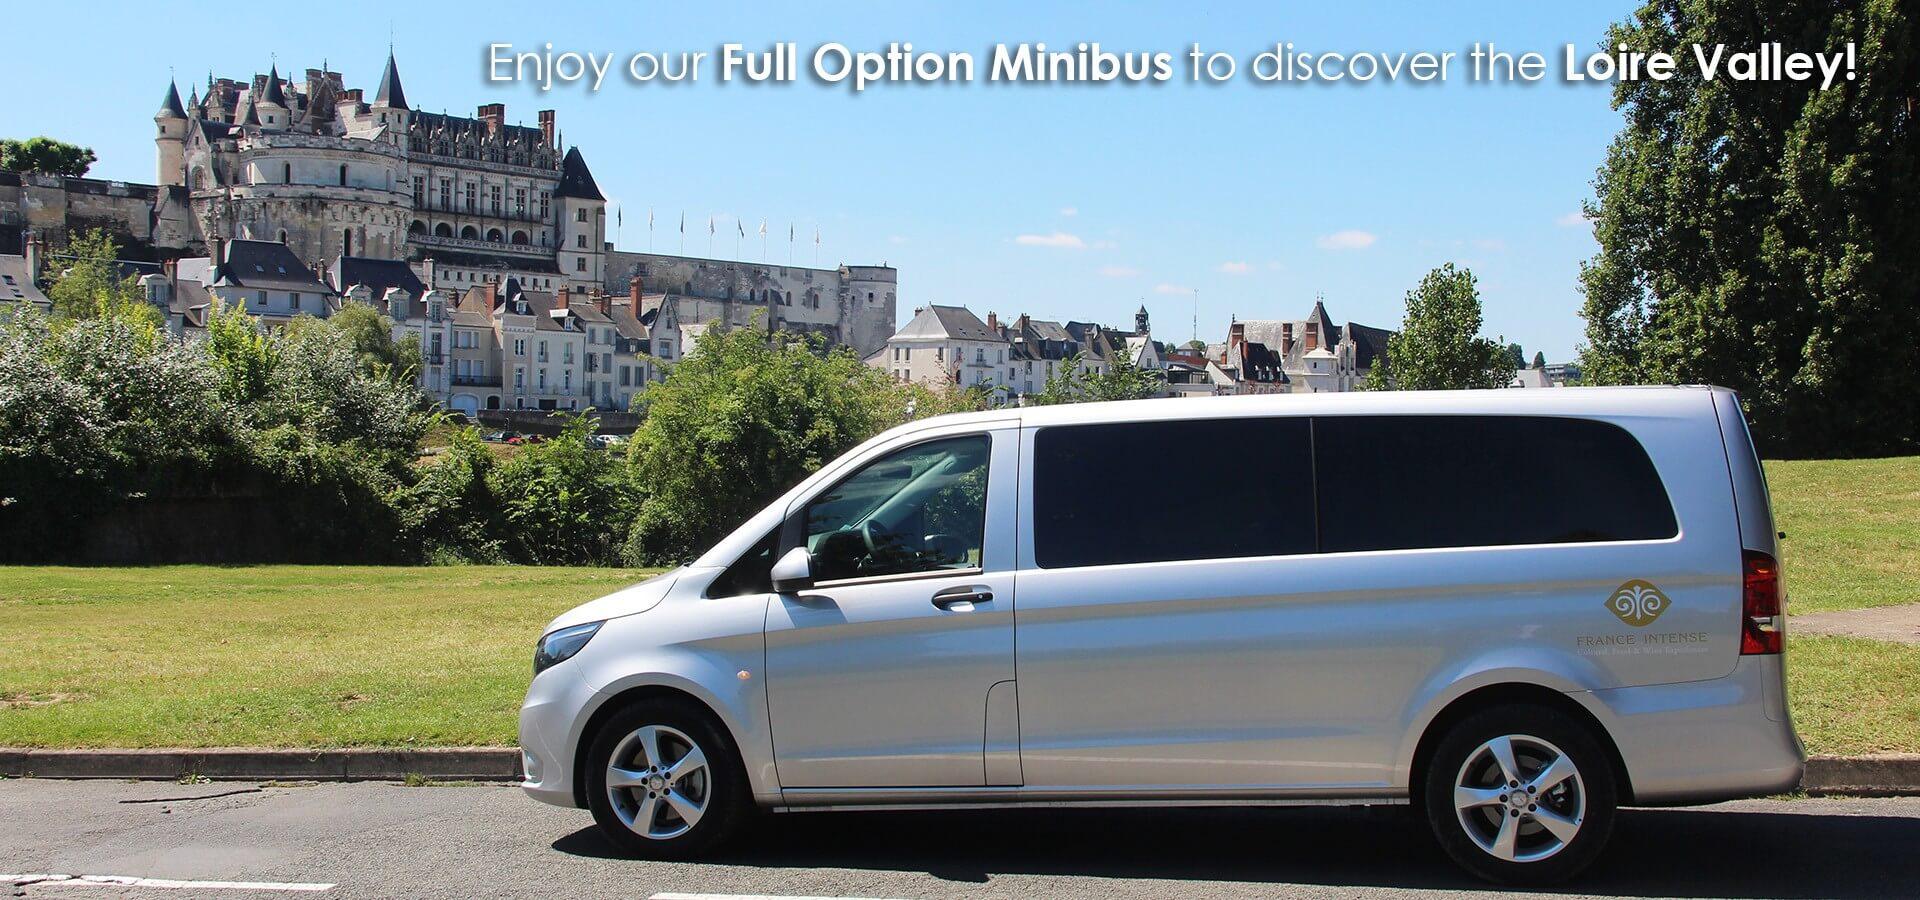 minibus, loire valley